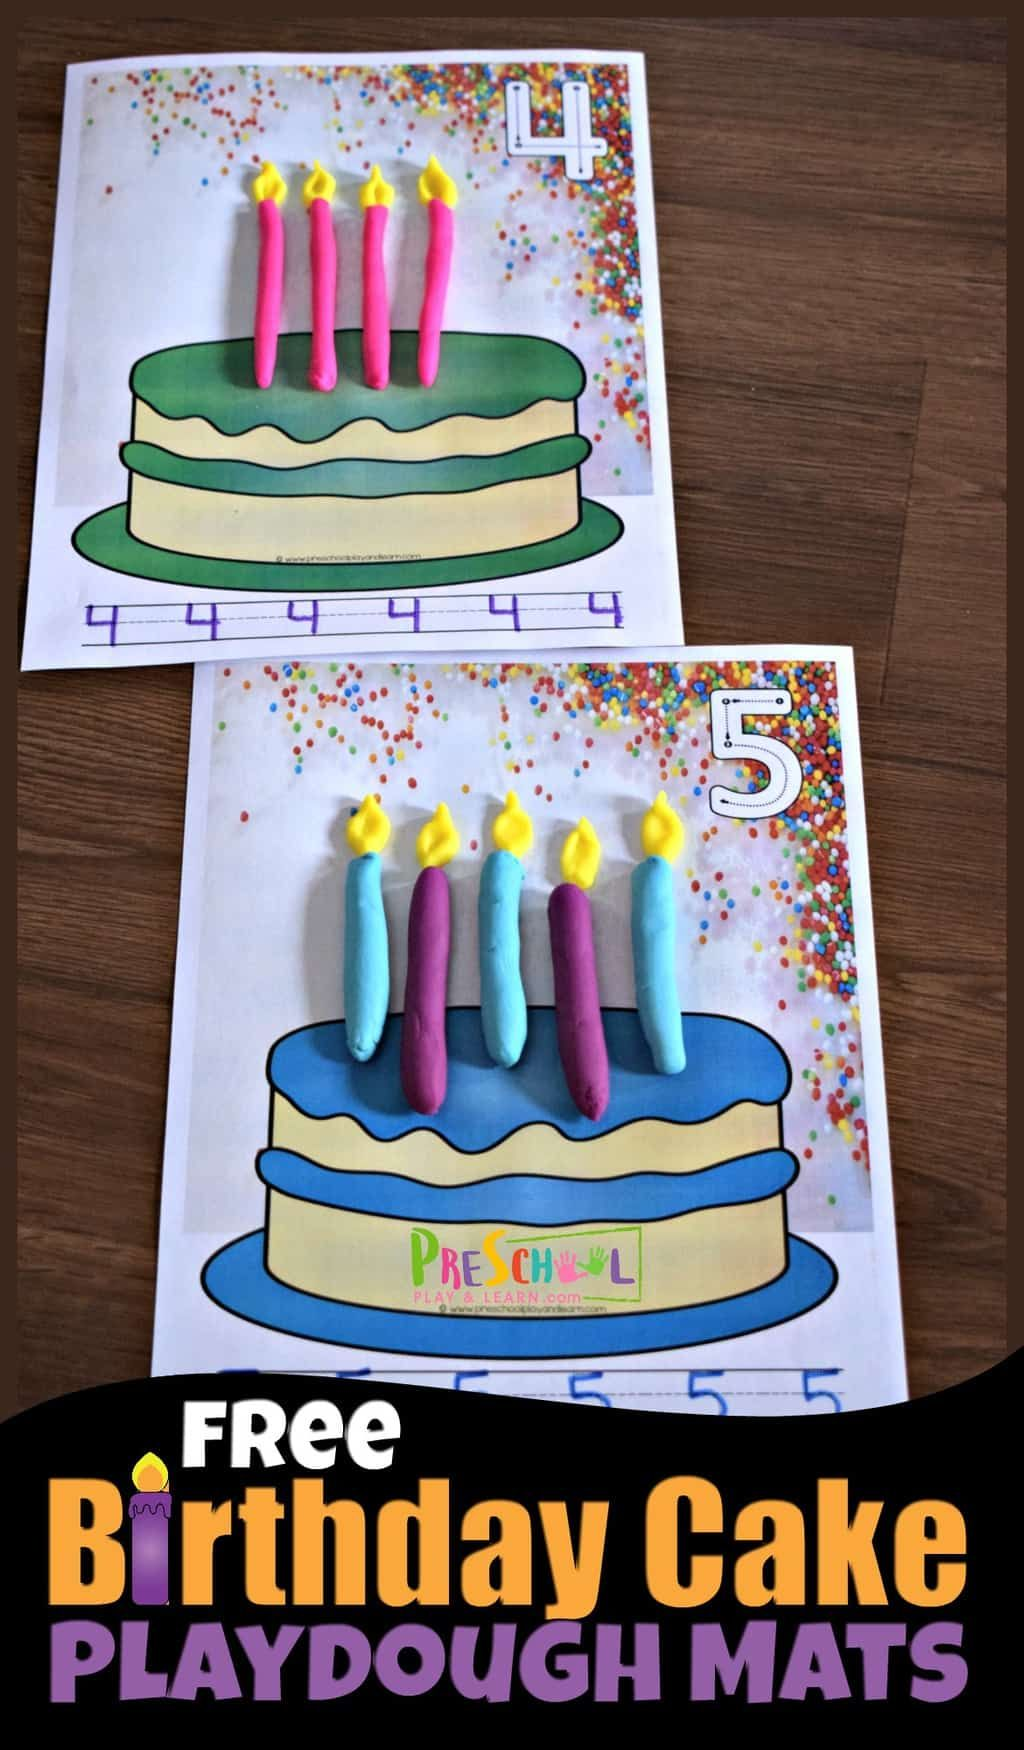 Free Birthday Candles Playdough Mats Preschool Birthday Free Birthday Stuff Playdough Activities [ 1750 x 1024 Pixel ]